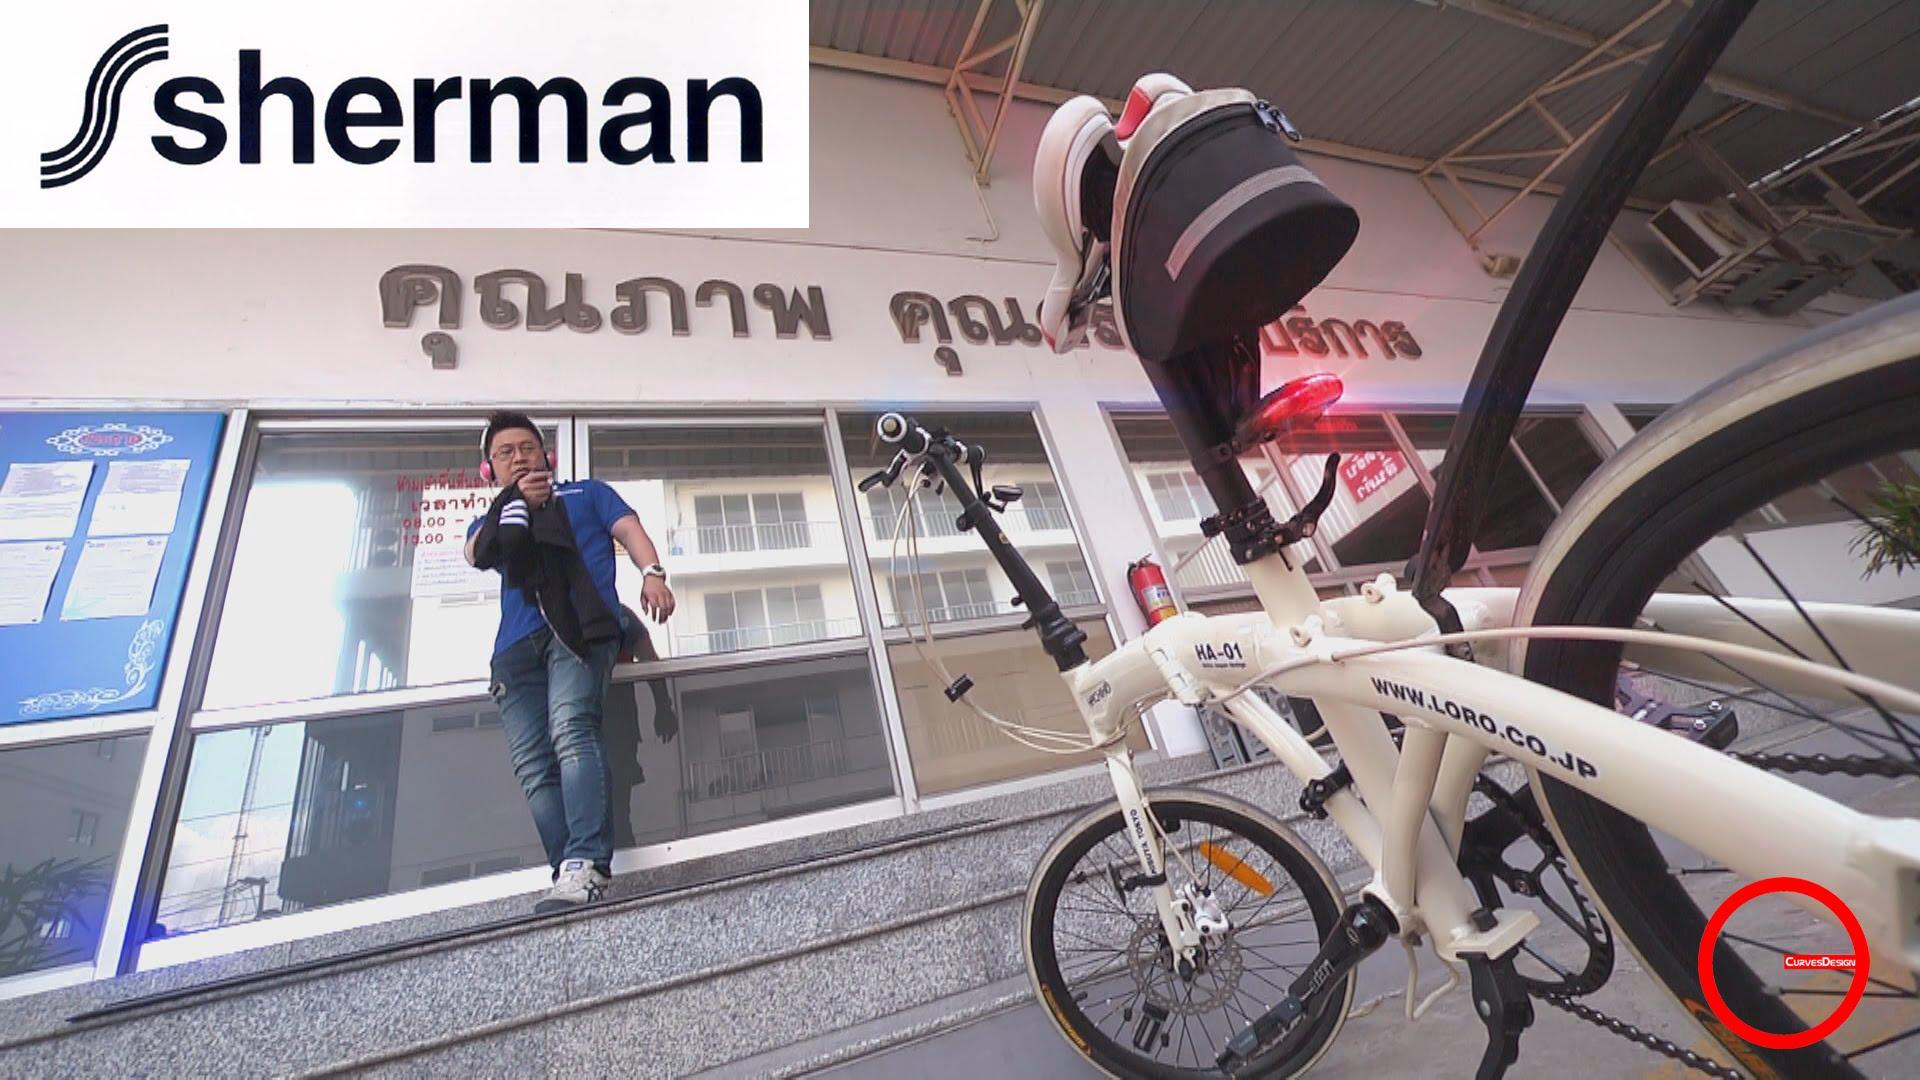 Sherman – ตัวจริงพลังหนักแน่น [ Official MV – Editor Cut ] เพลงใหม่ล่าสุด 2016